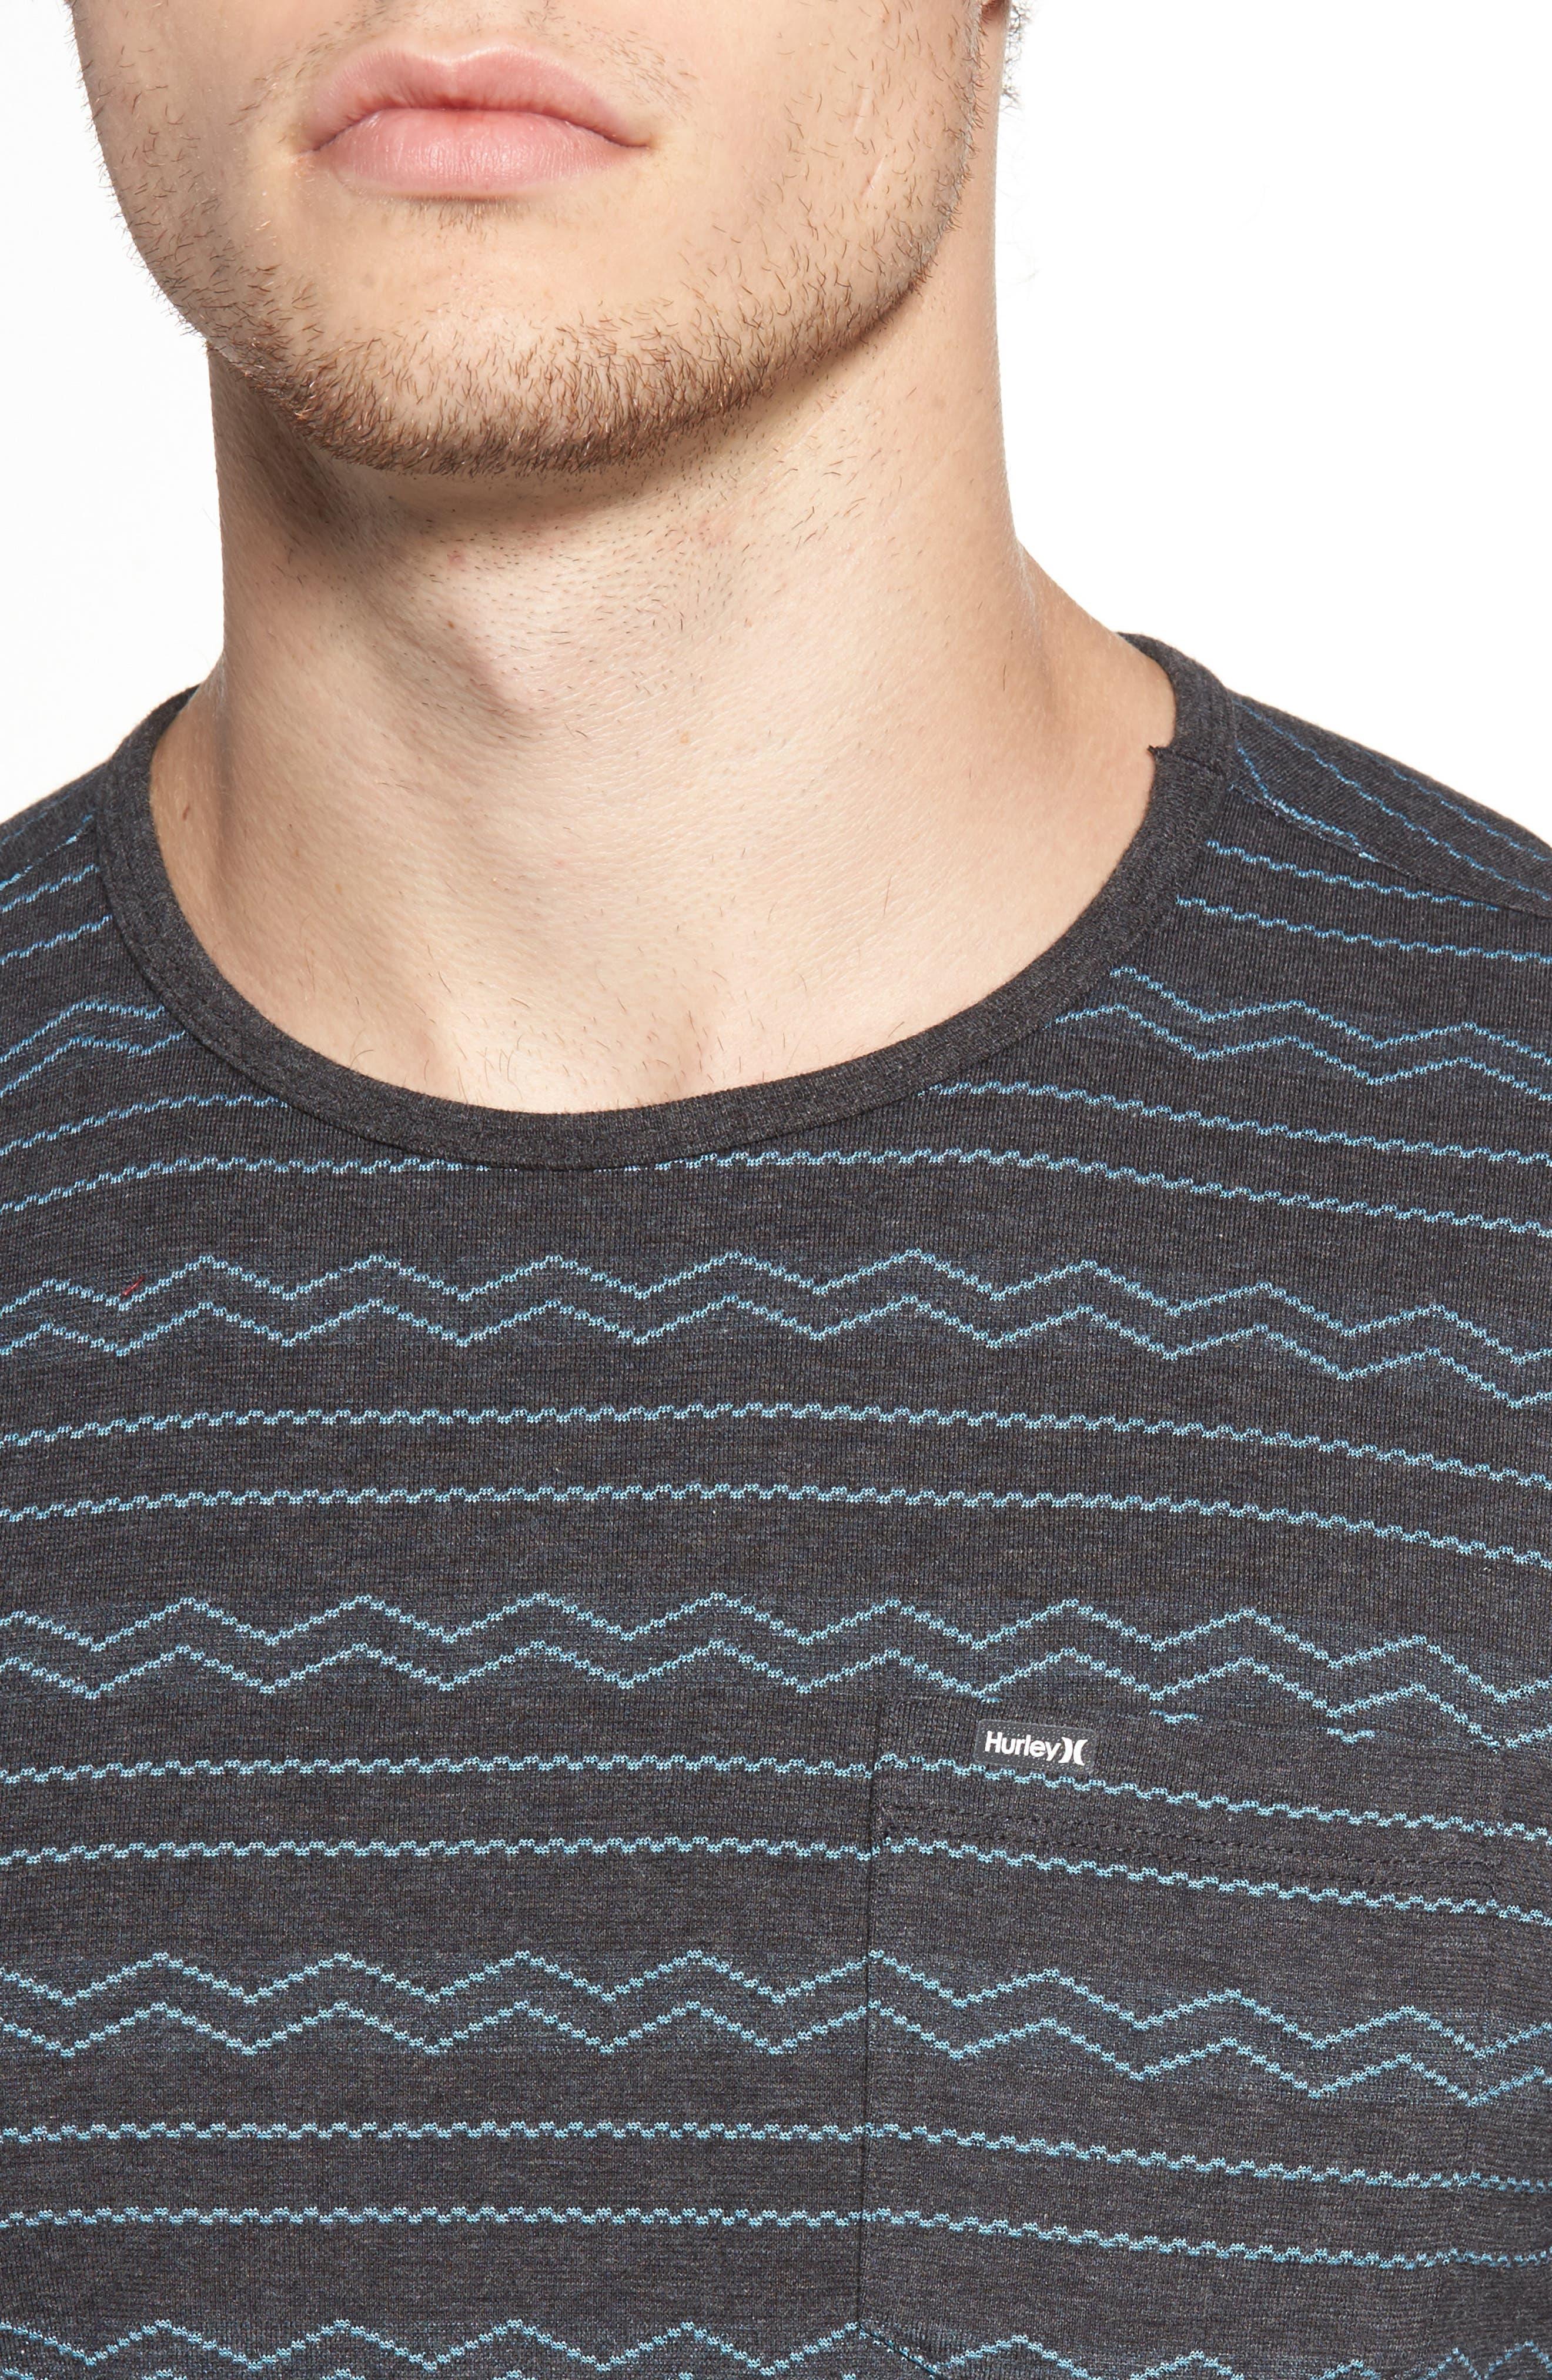 Pismo Dri-FIT T-Shirt,                             Alternate thumbnail 4, color,                             007